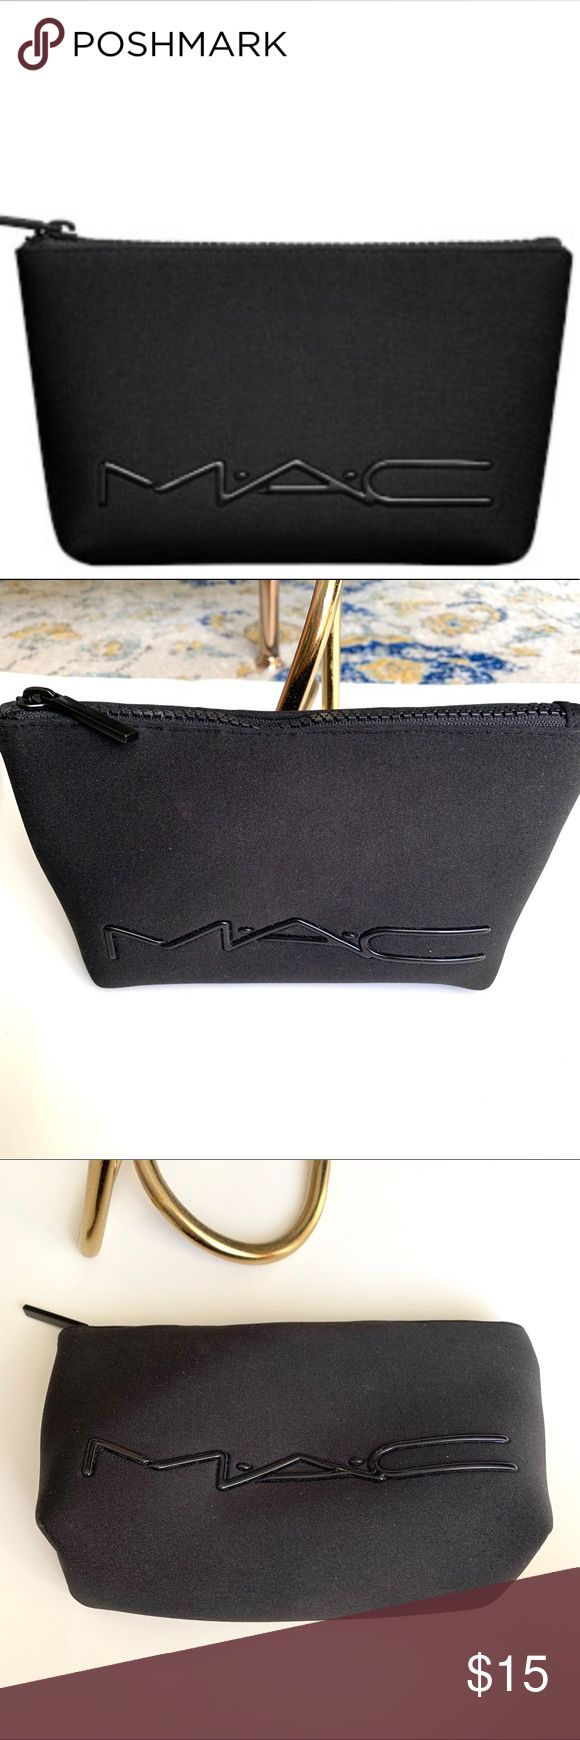 MAC Cosmetics Black Neoprene Makeup Bag A small pouch style neoprene makeup bag …